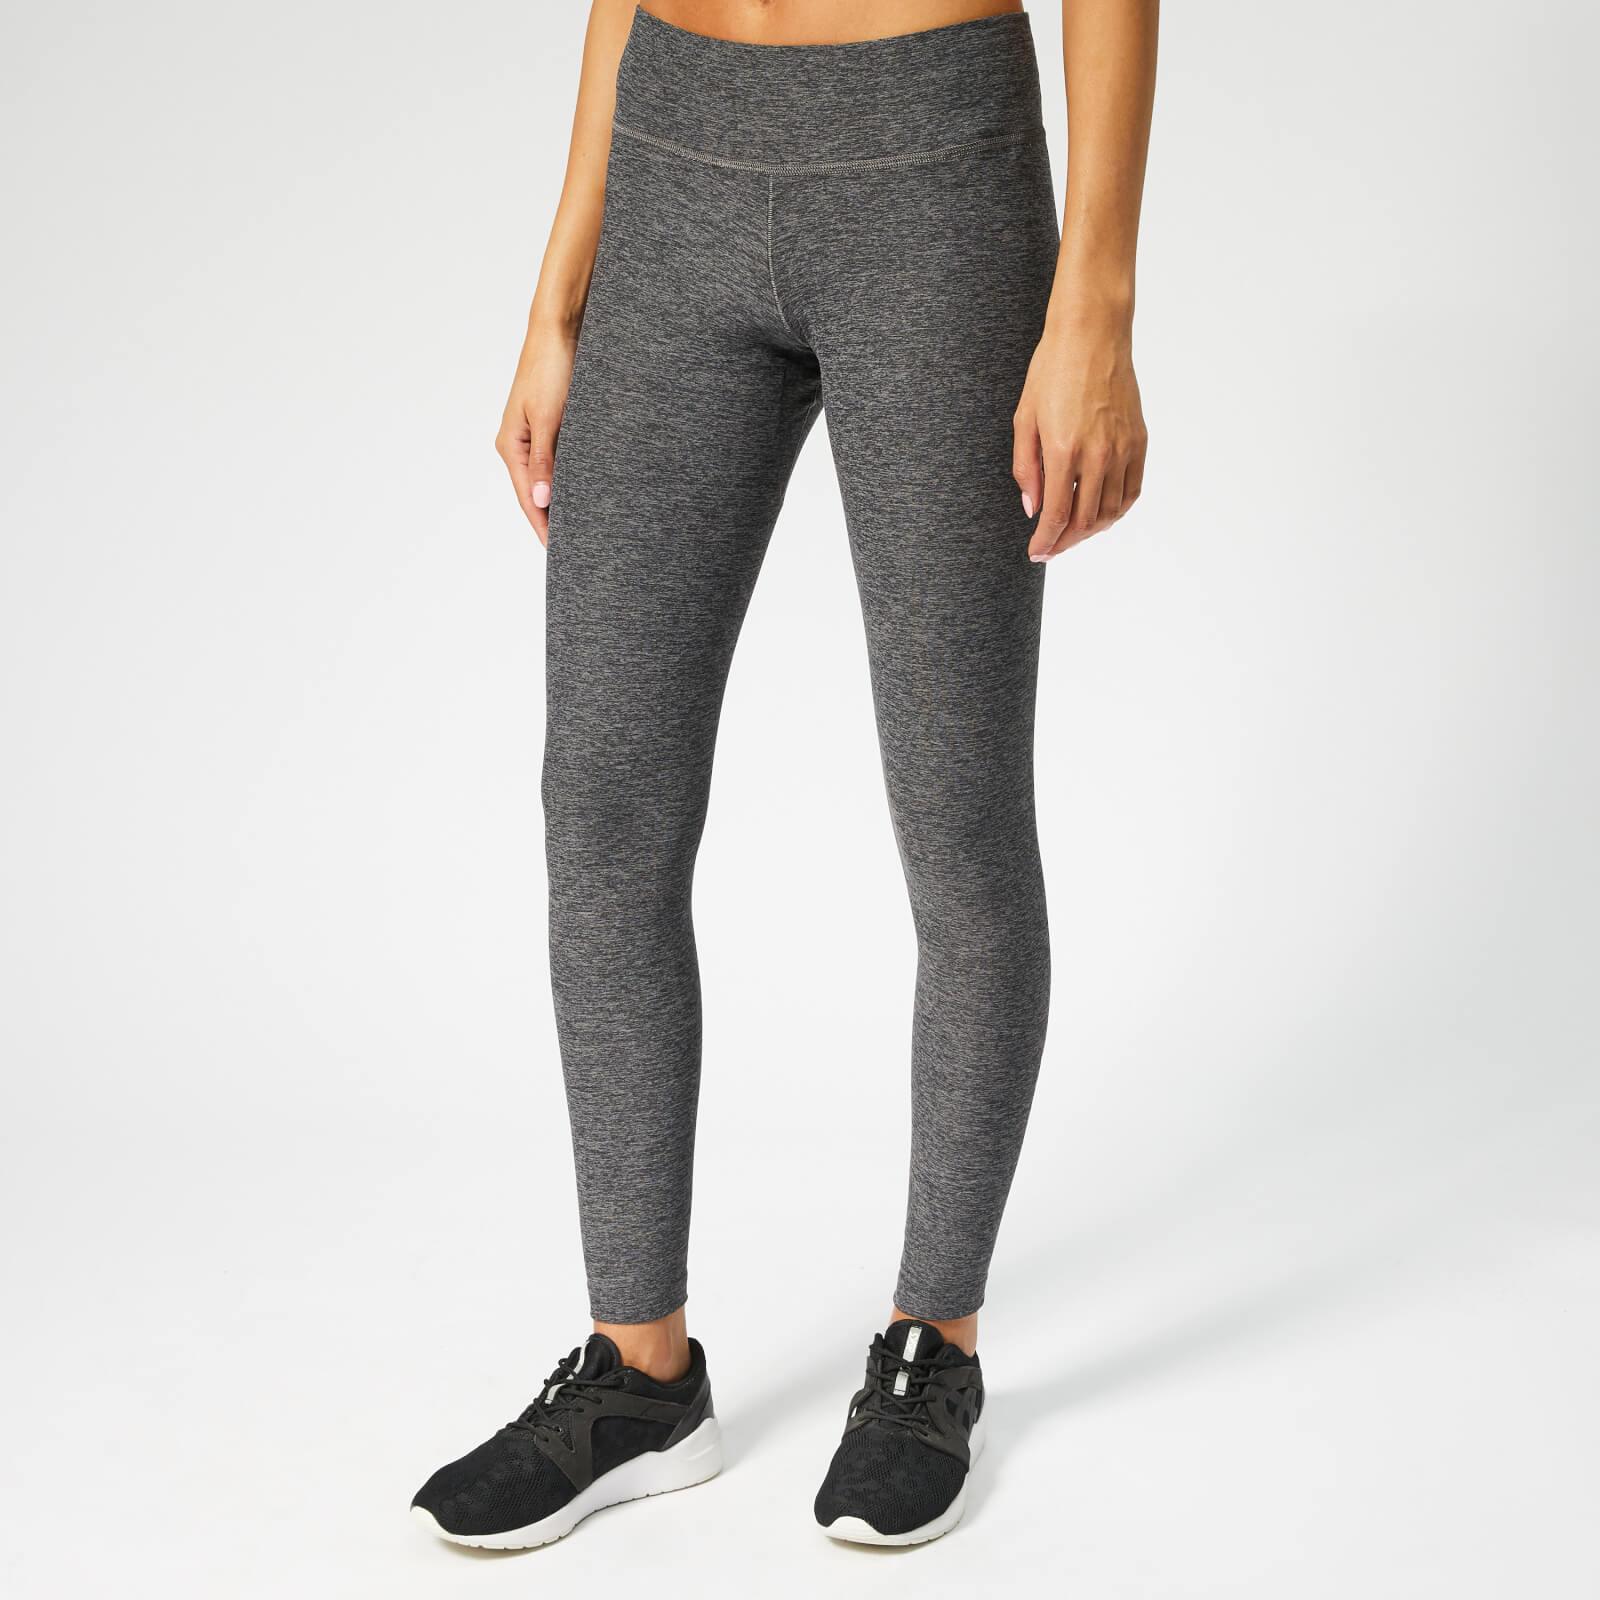 3a90d52f38b adidas Women's Terrex CTC Tights - Black Womens Clothing | TheHut.com